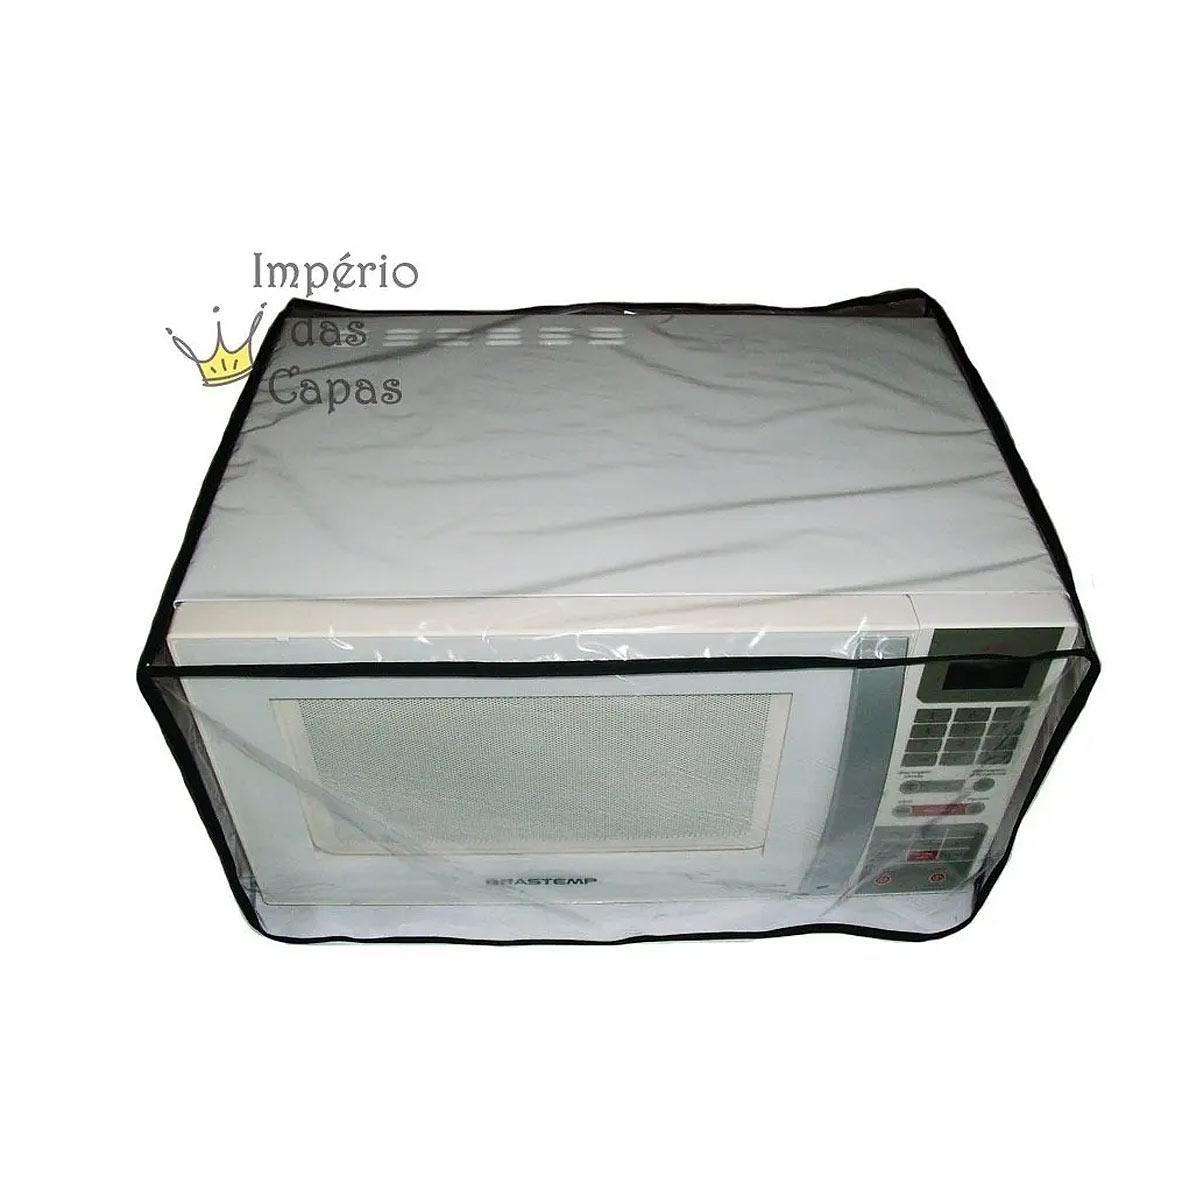 Capa Para Forno Microondas 30 L - Em Pvc Cristal - Tam M